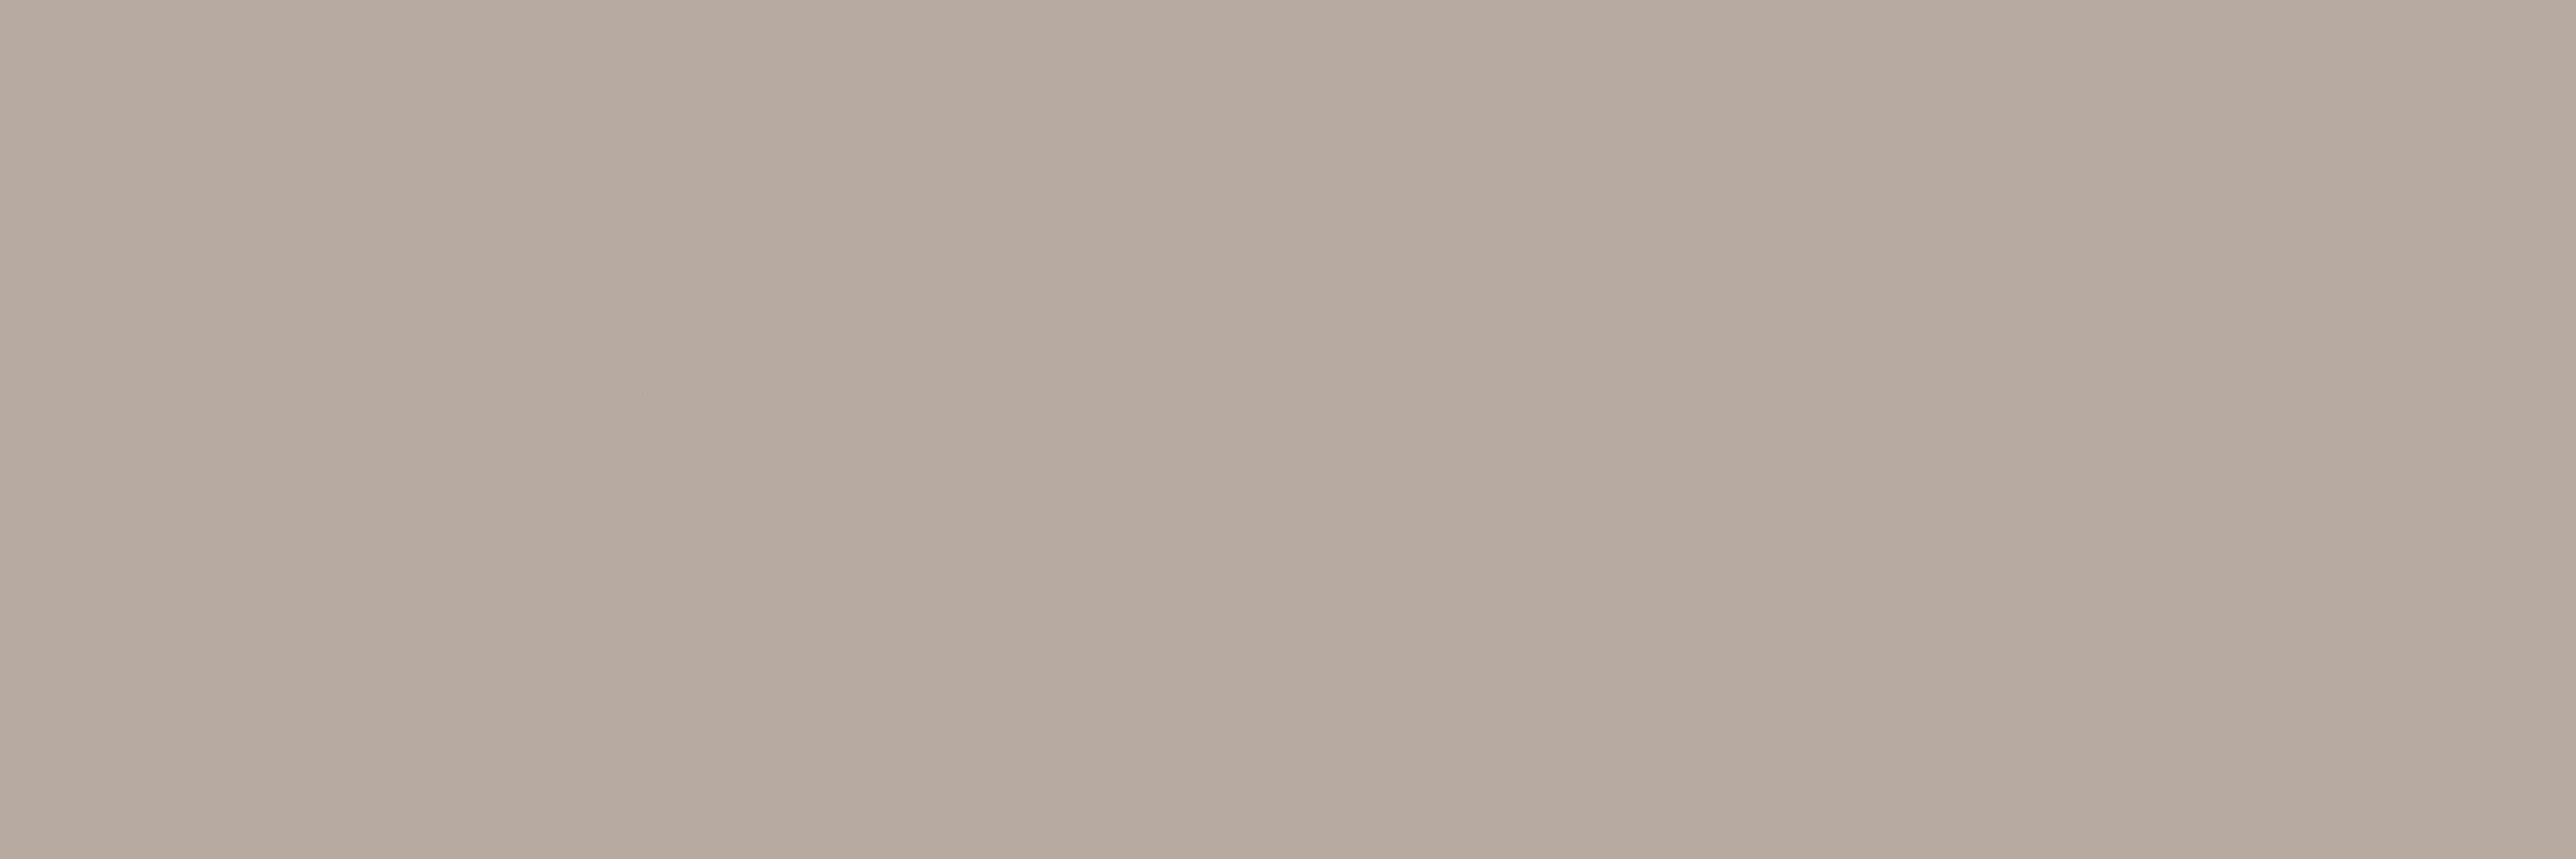 84ba81s_coverlam-basic-taupe-100x300_rgb